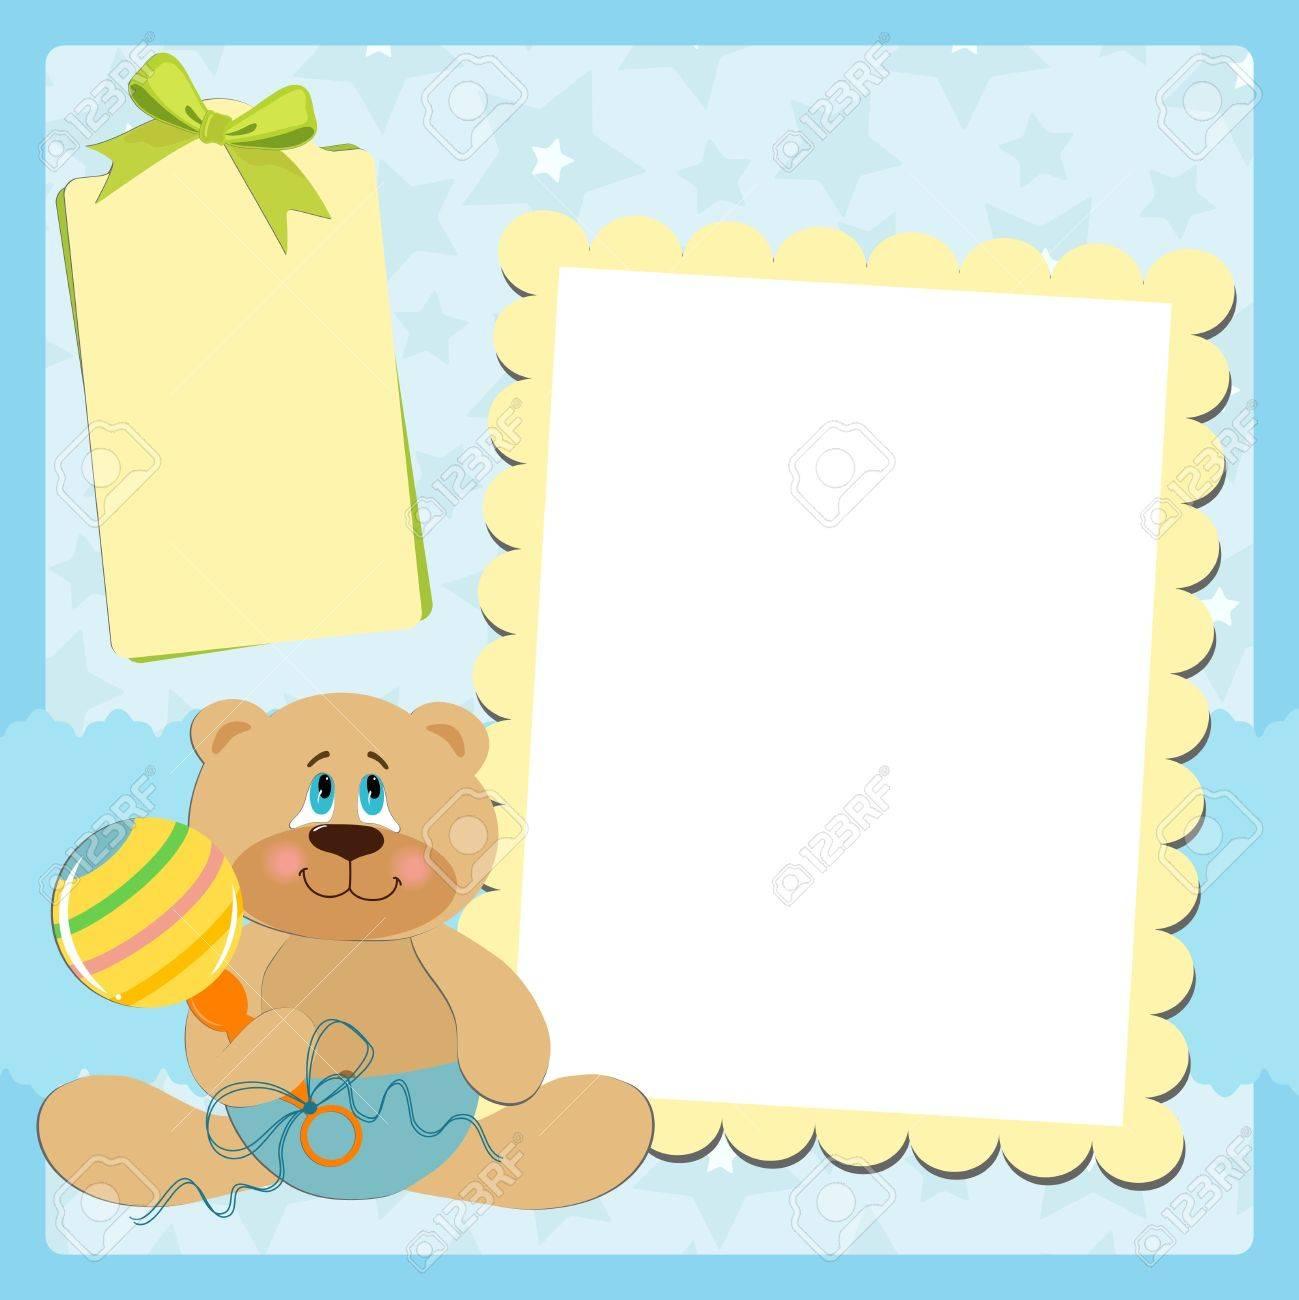 Blank Birthday Card Templates birthday card phrases – Free Blank Greeting Card Templates